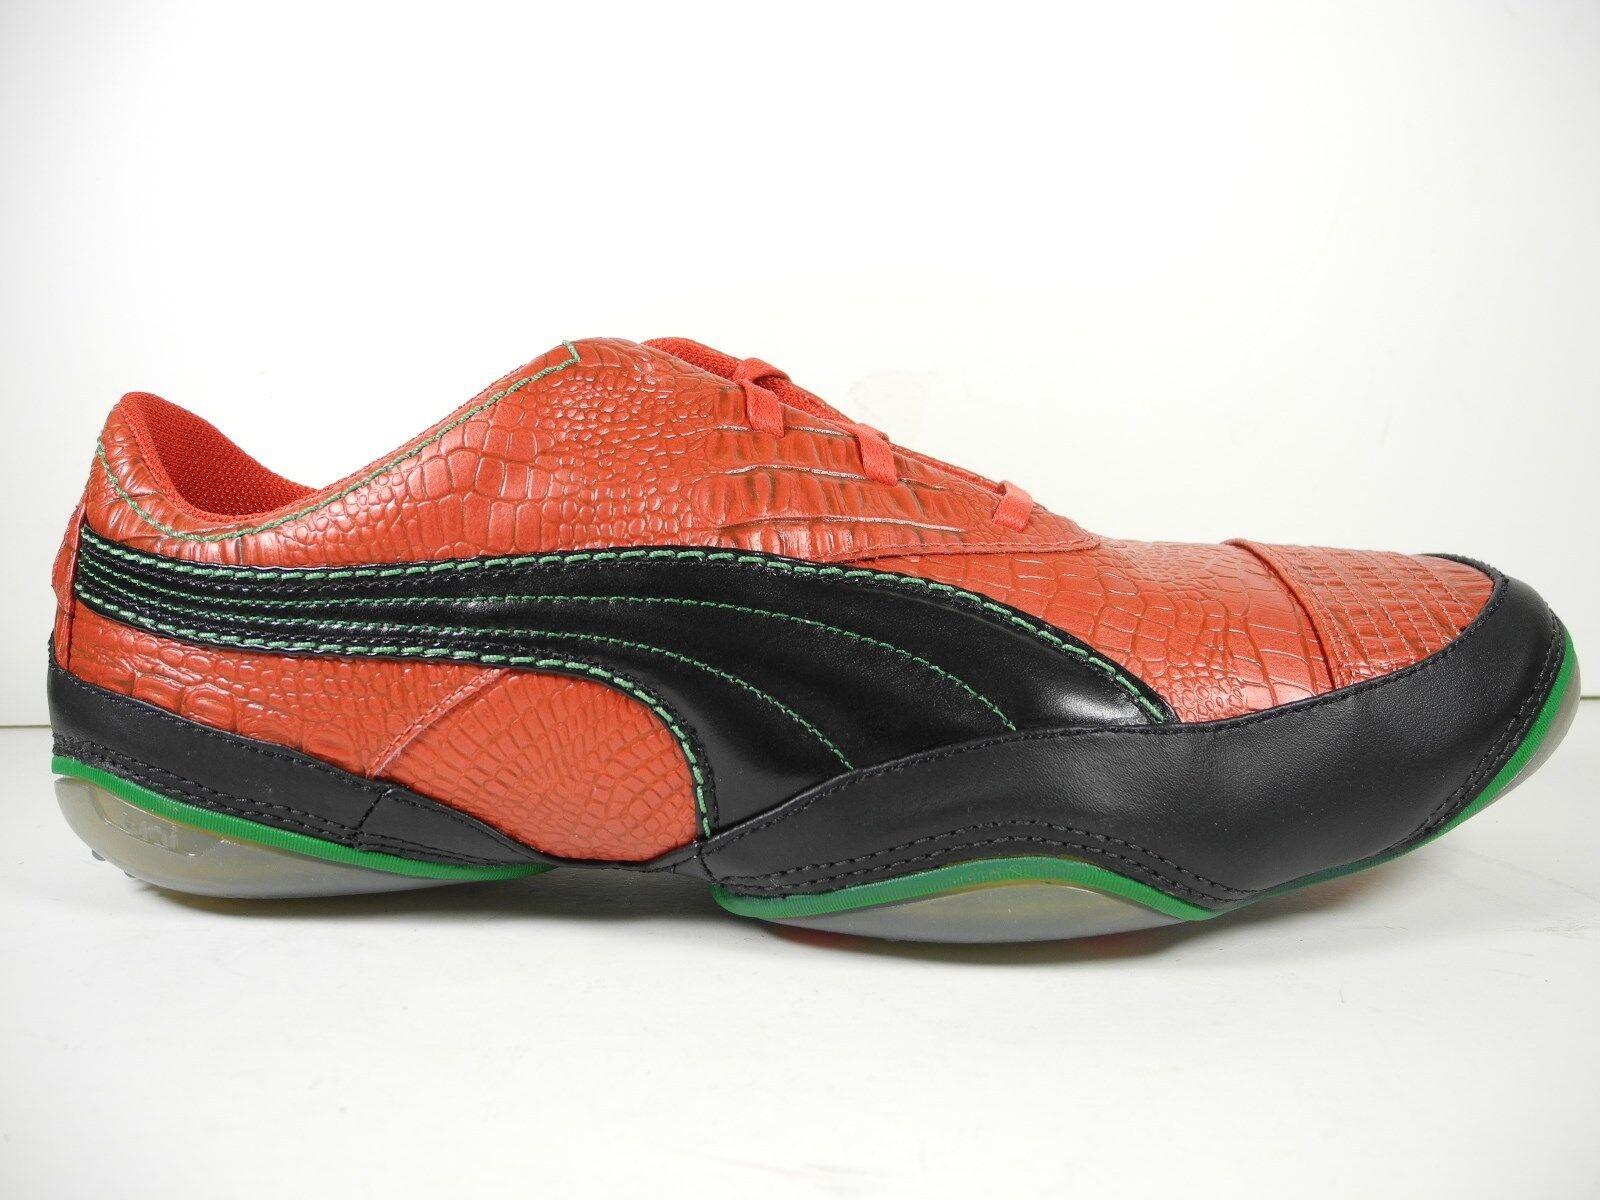 NEW Puma USAN METALLIC CROC Men's Shoes Size 11.5